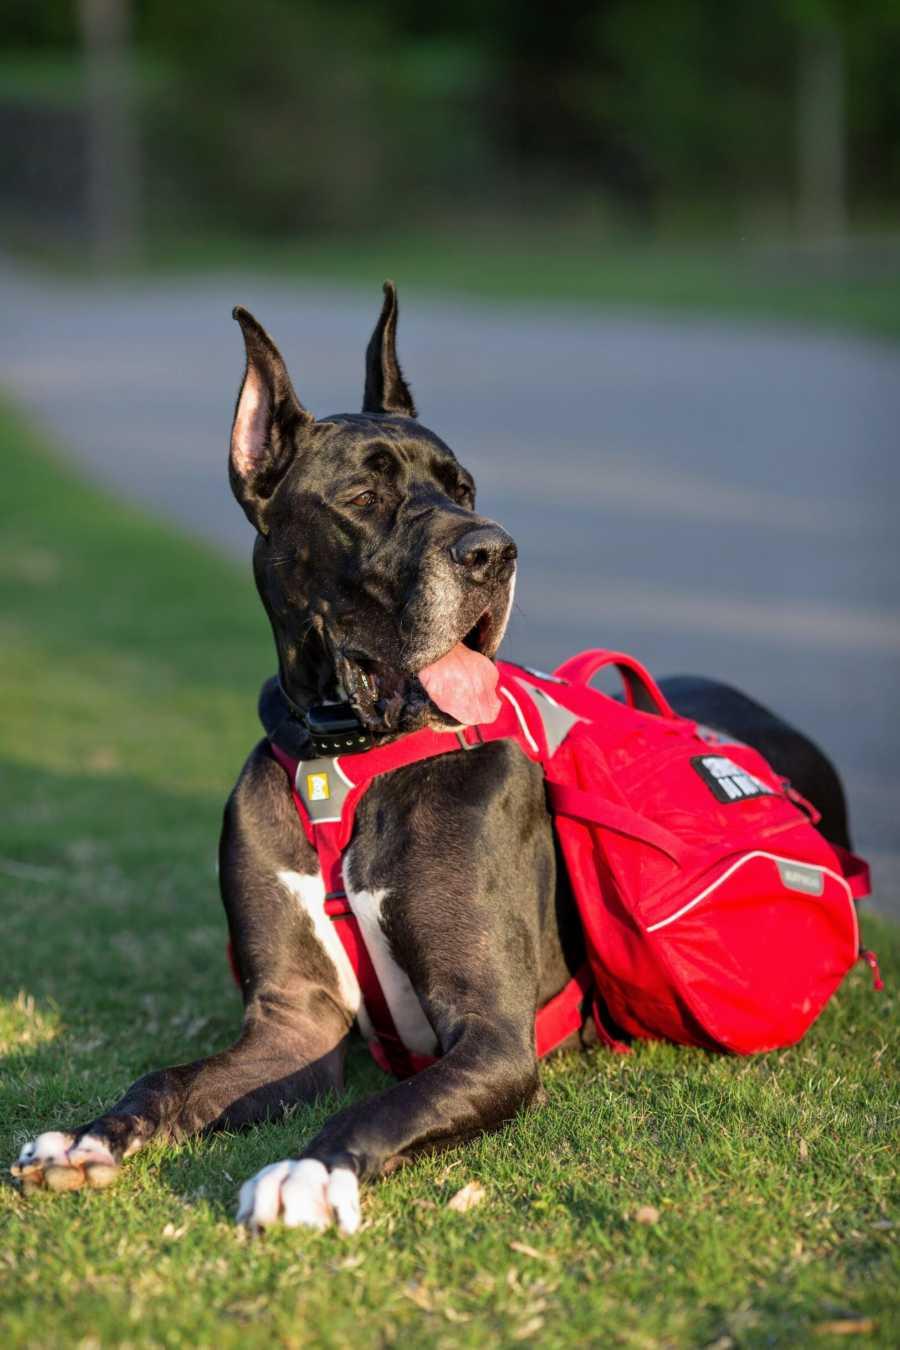 A big black service dog wearing a red vest